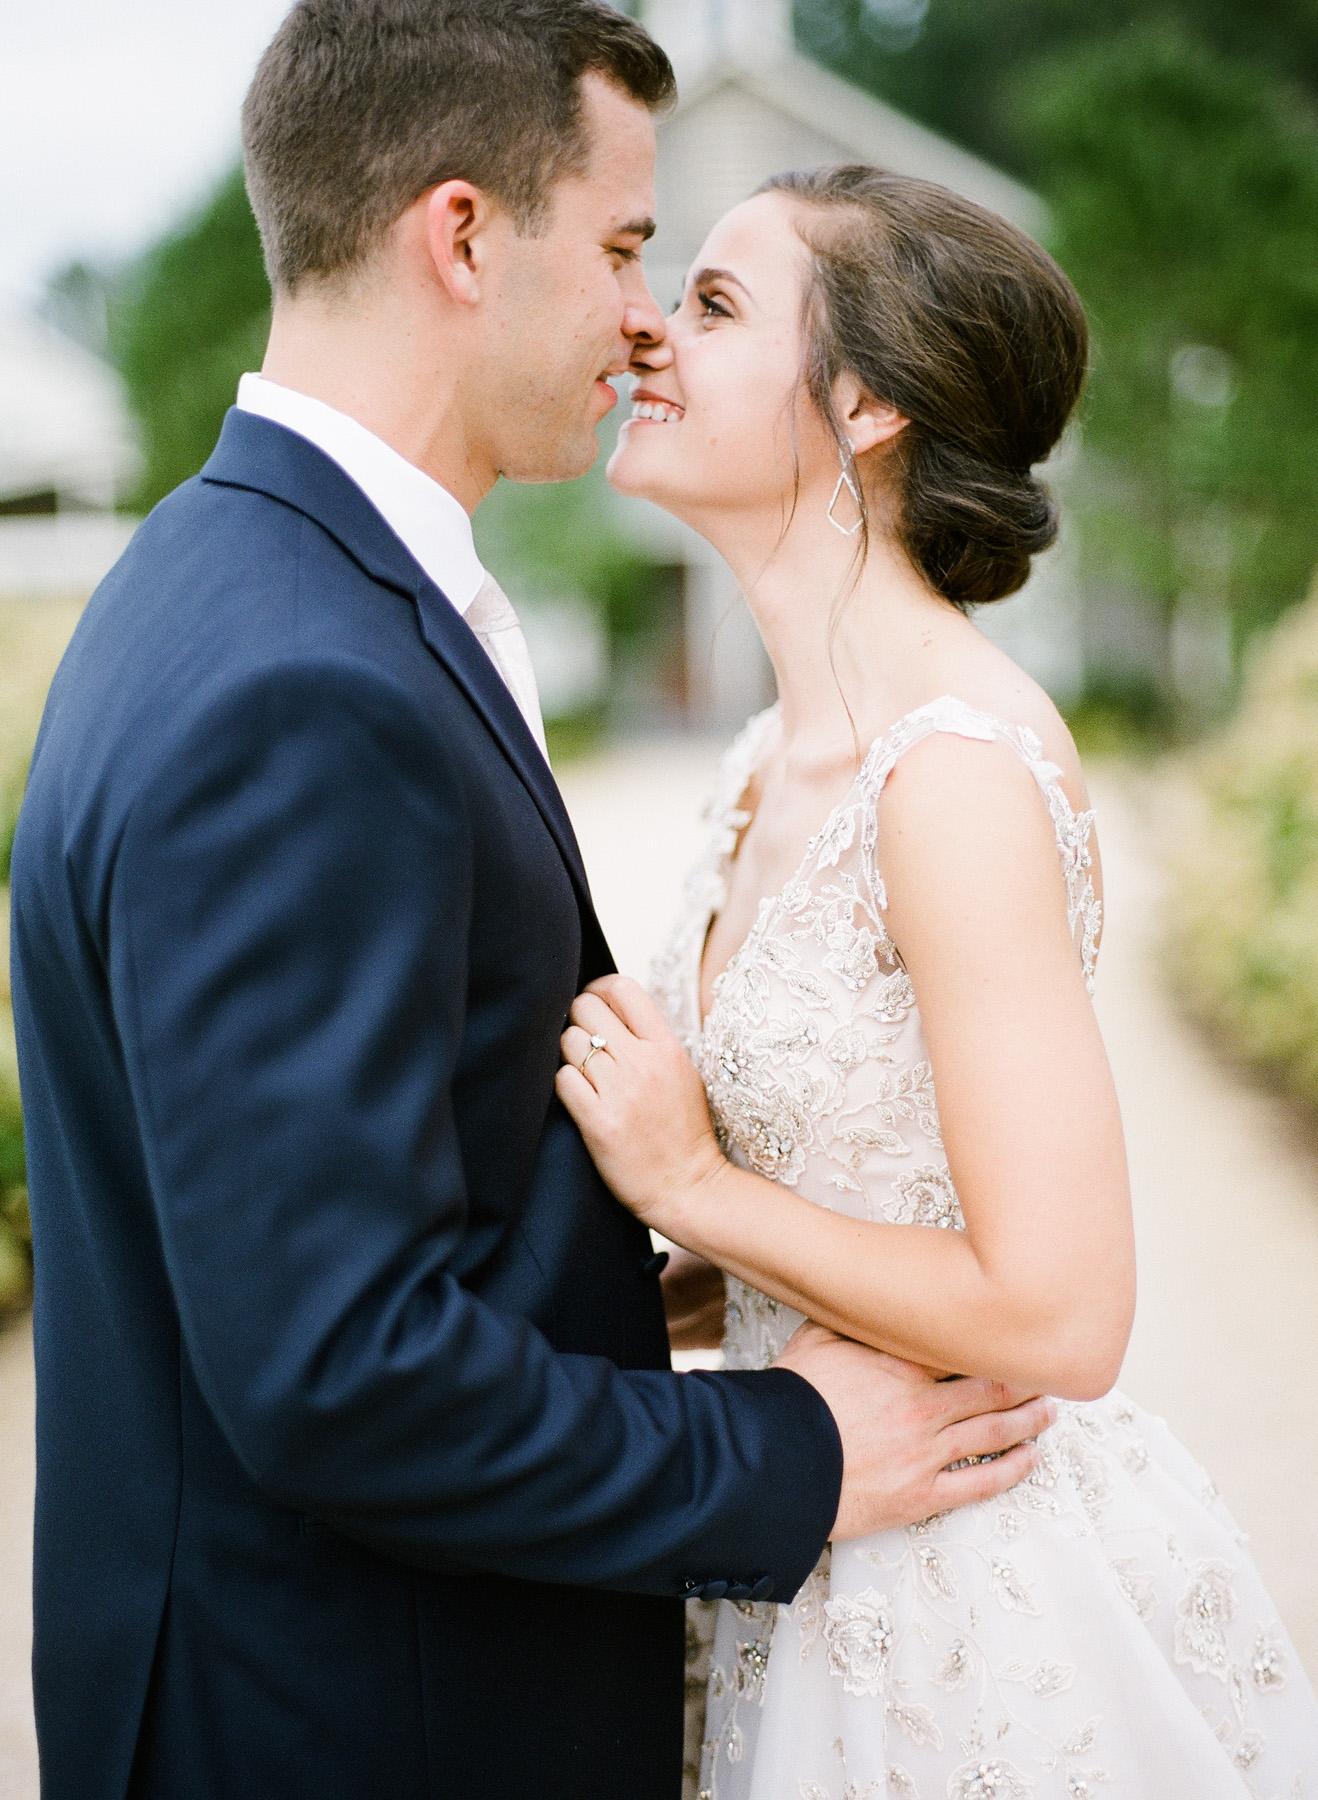 Pippin-Hill-Farm-and-Vinyards-Wedding-Film-Photography-17.jpg